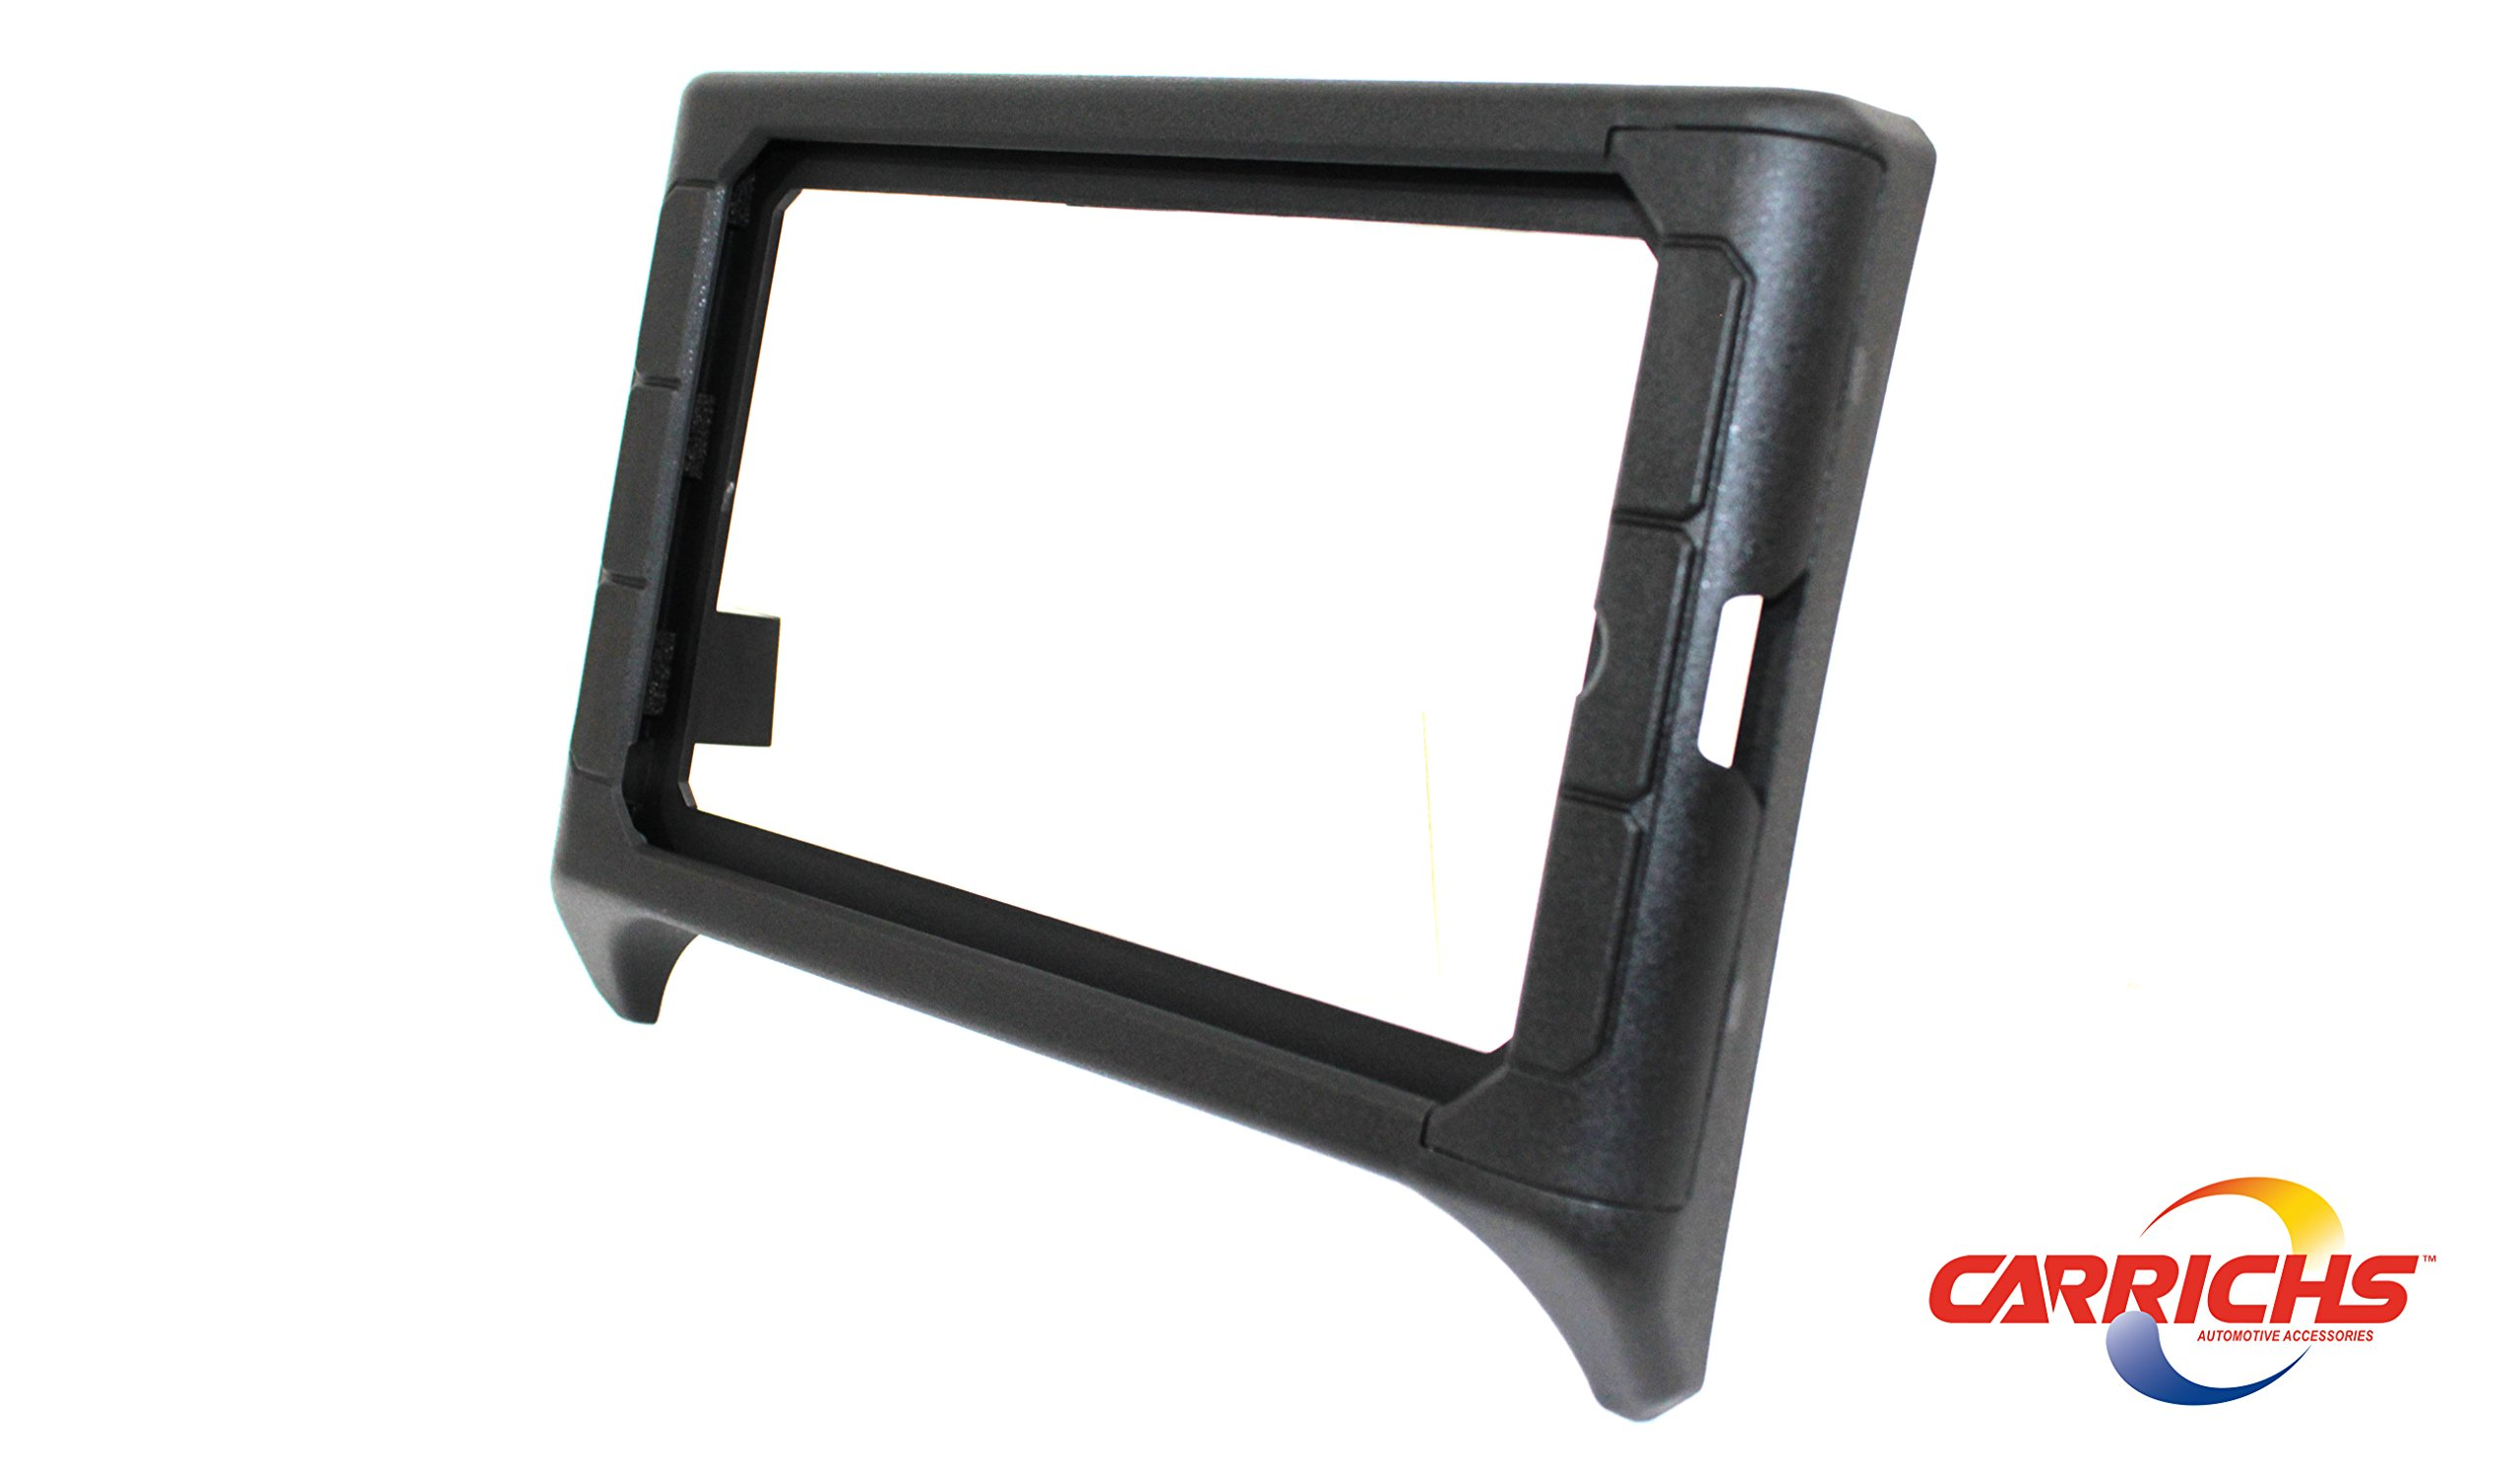 Carrichs TDK638 Tablet Dash Mount | 15-18 Ford F-150 & 17-18 Ford F-250 F-350 Super Duty (8'' Screen)